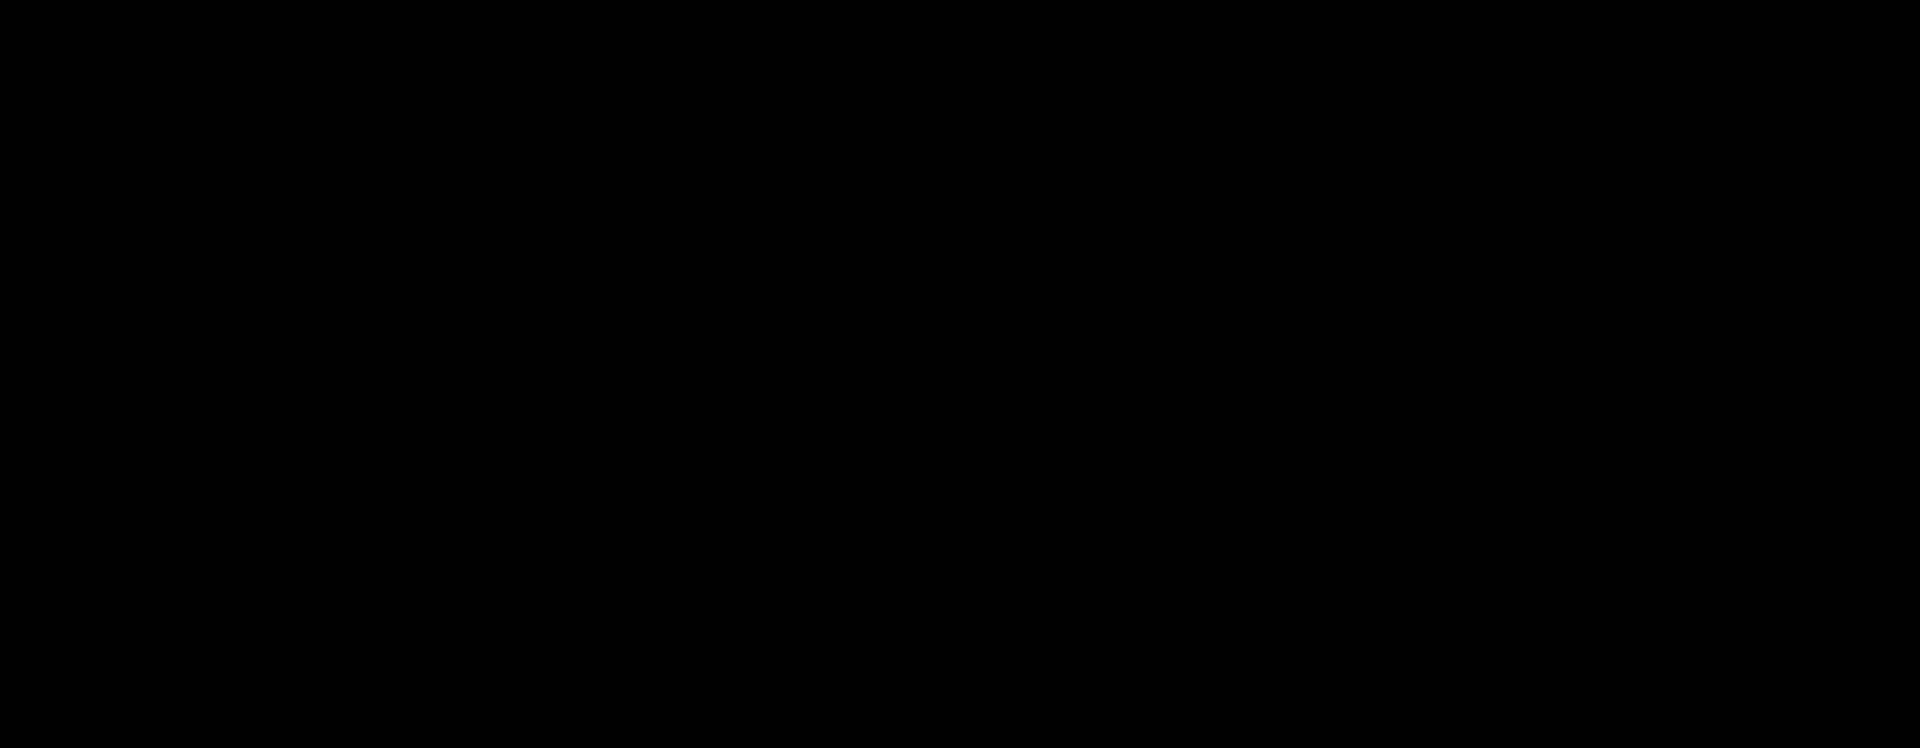 Taljogram logotype